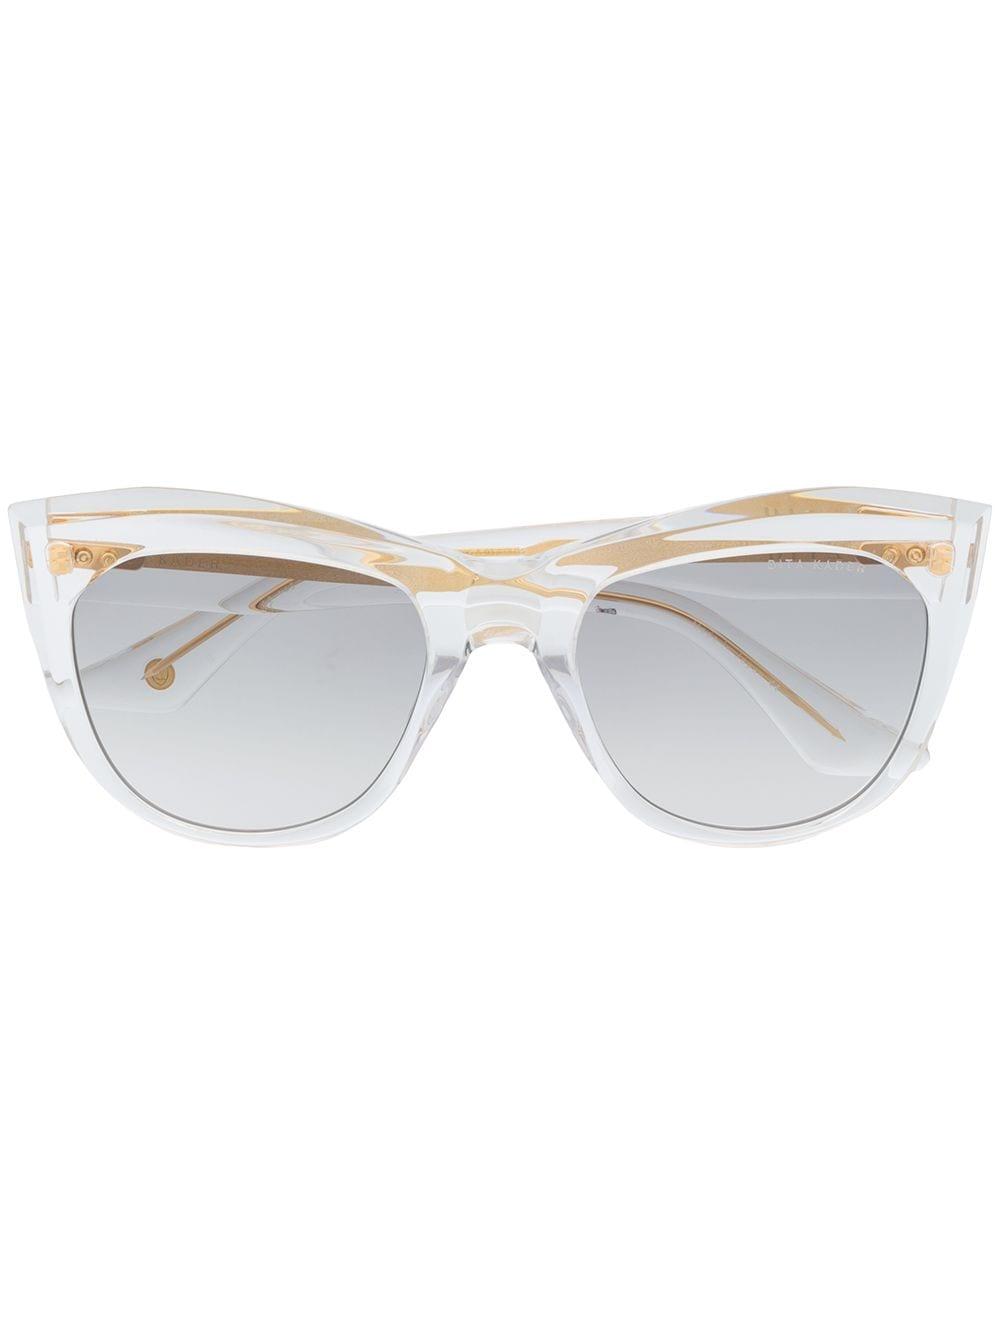 Dita Eyewear Eckige 'Kader' Sonnenbrille - Nude